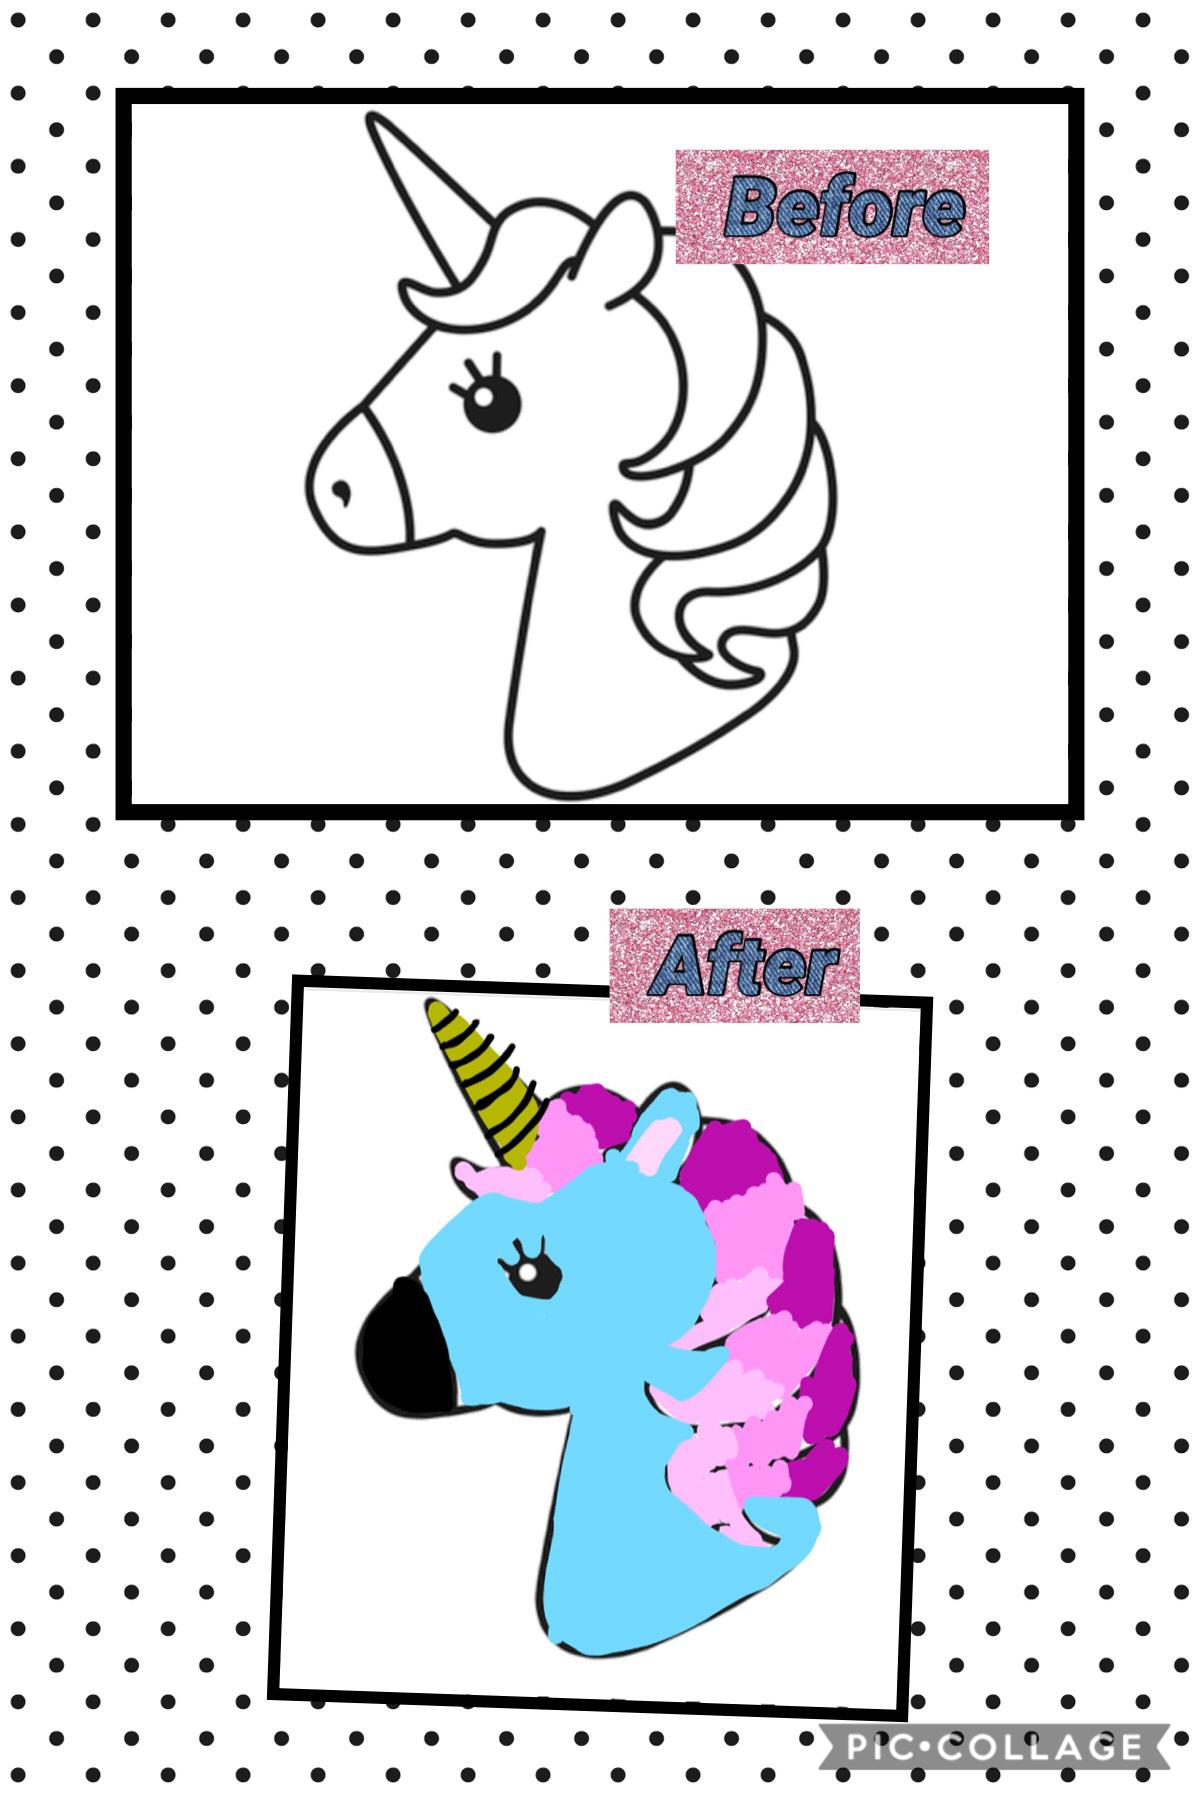 Unicorn power!